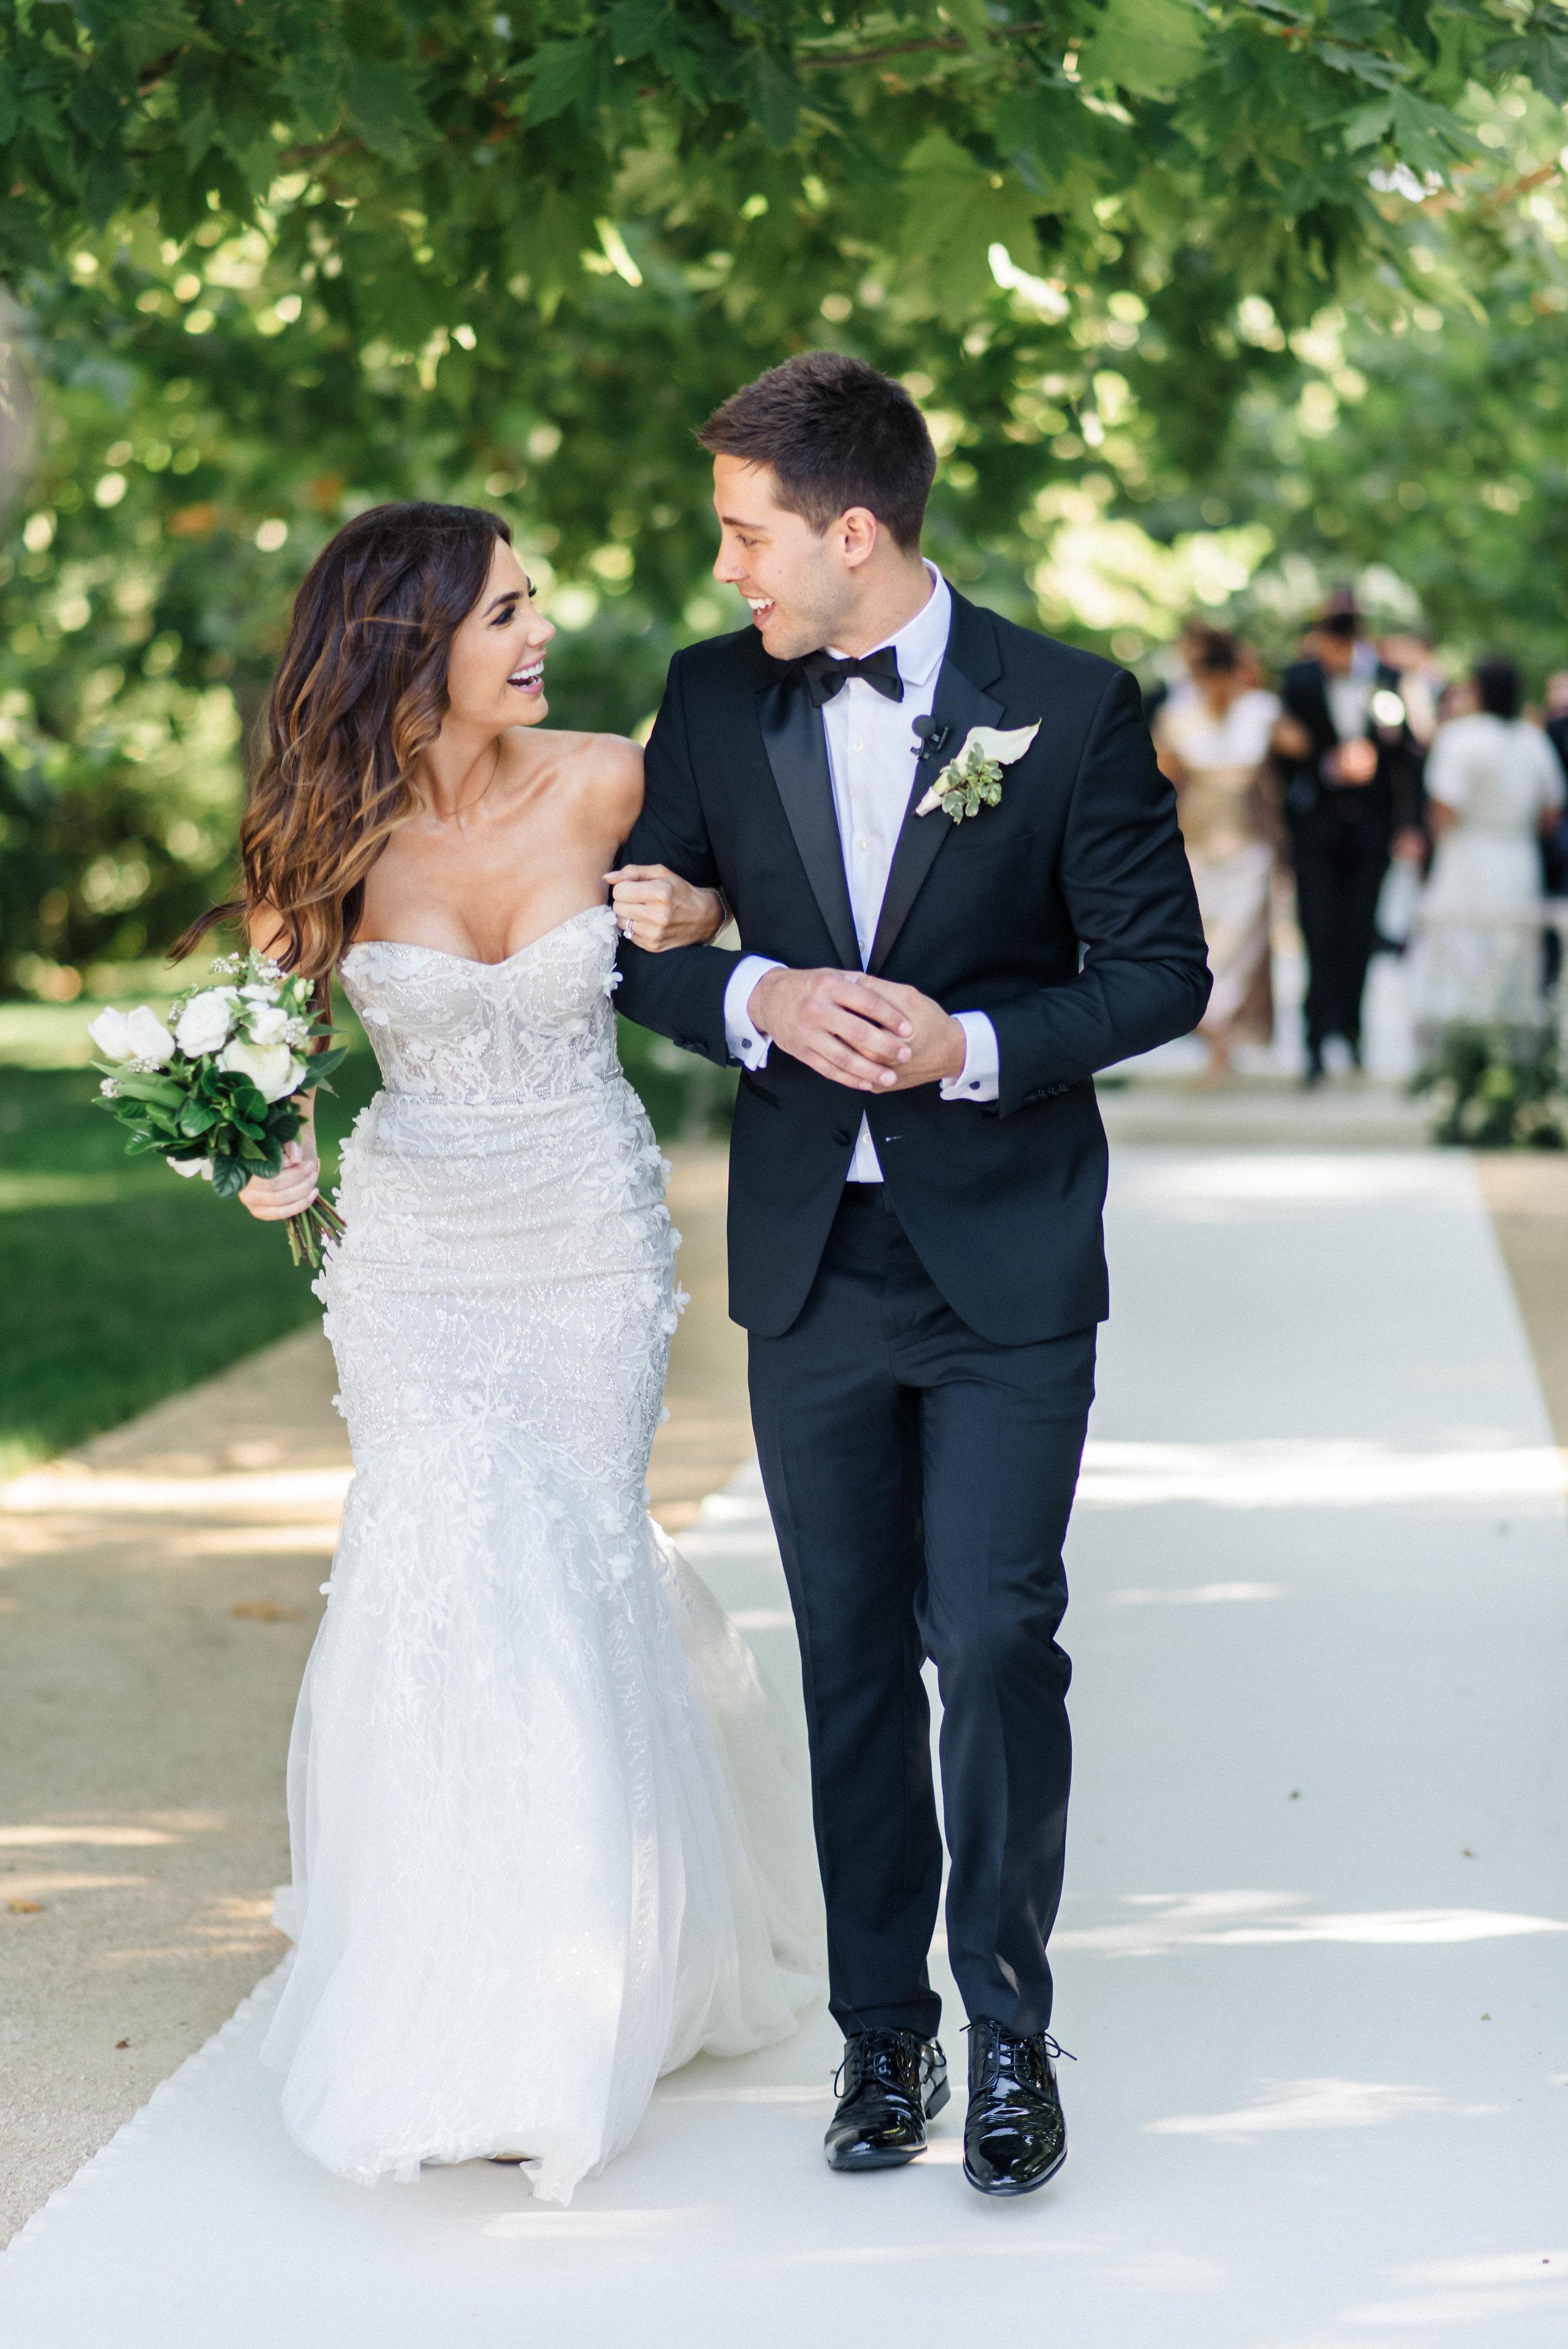 JillianMurray_Deangeyer_Wedding_Jana_Williams_Photography-8405.jpg